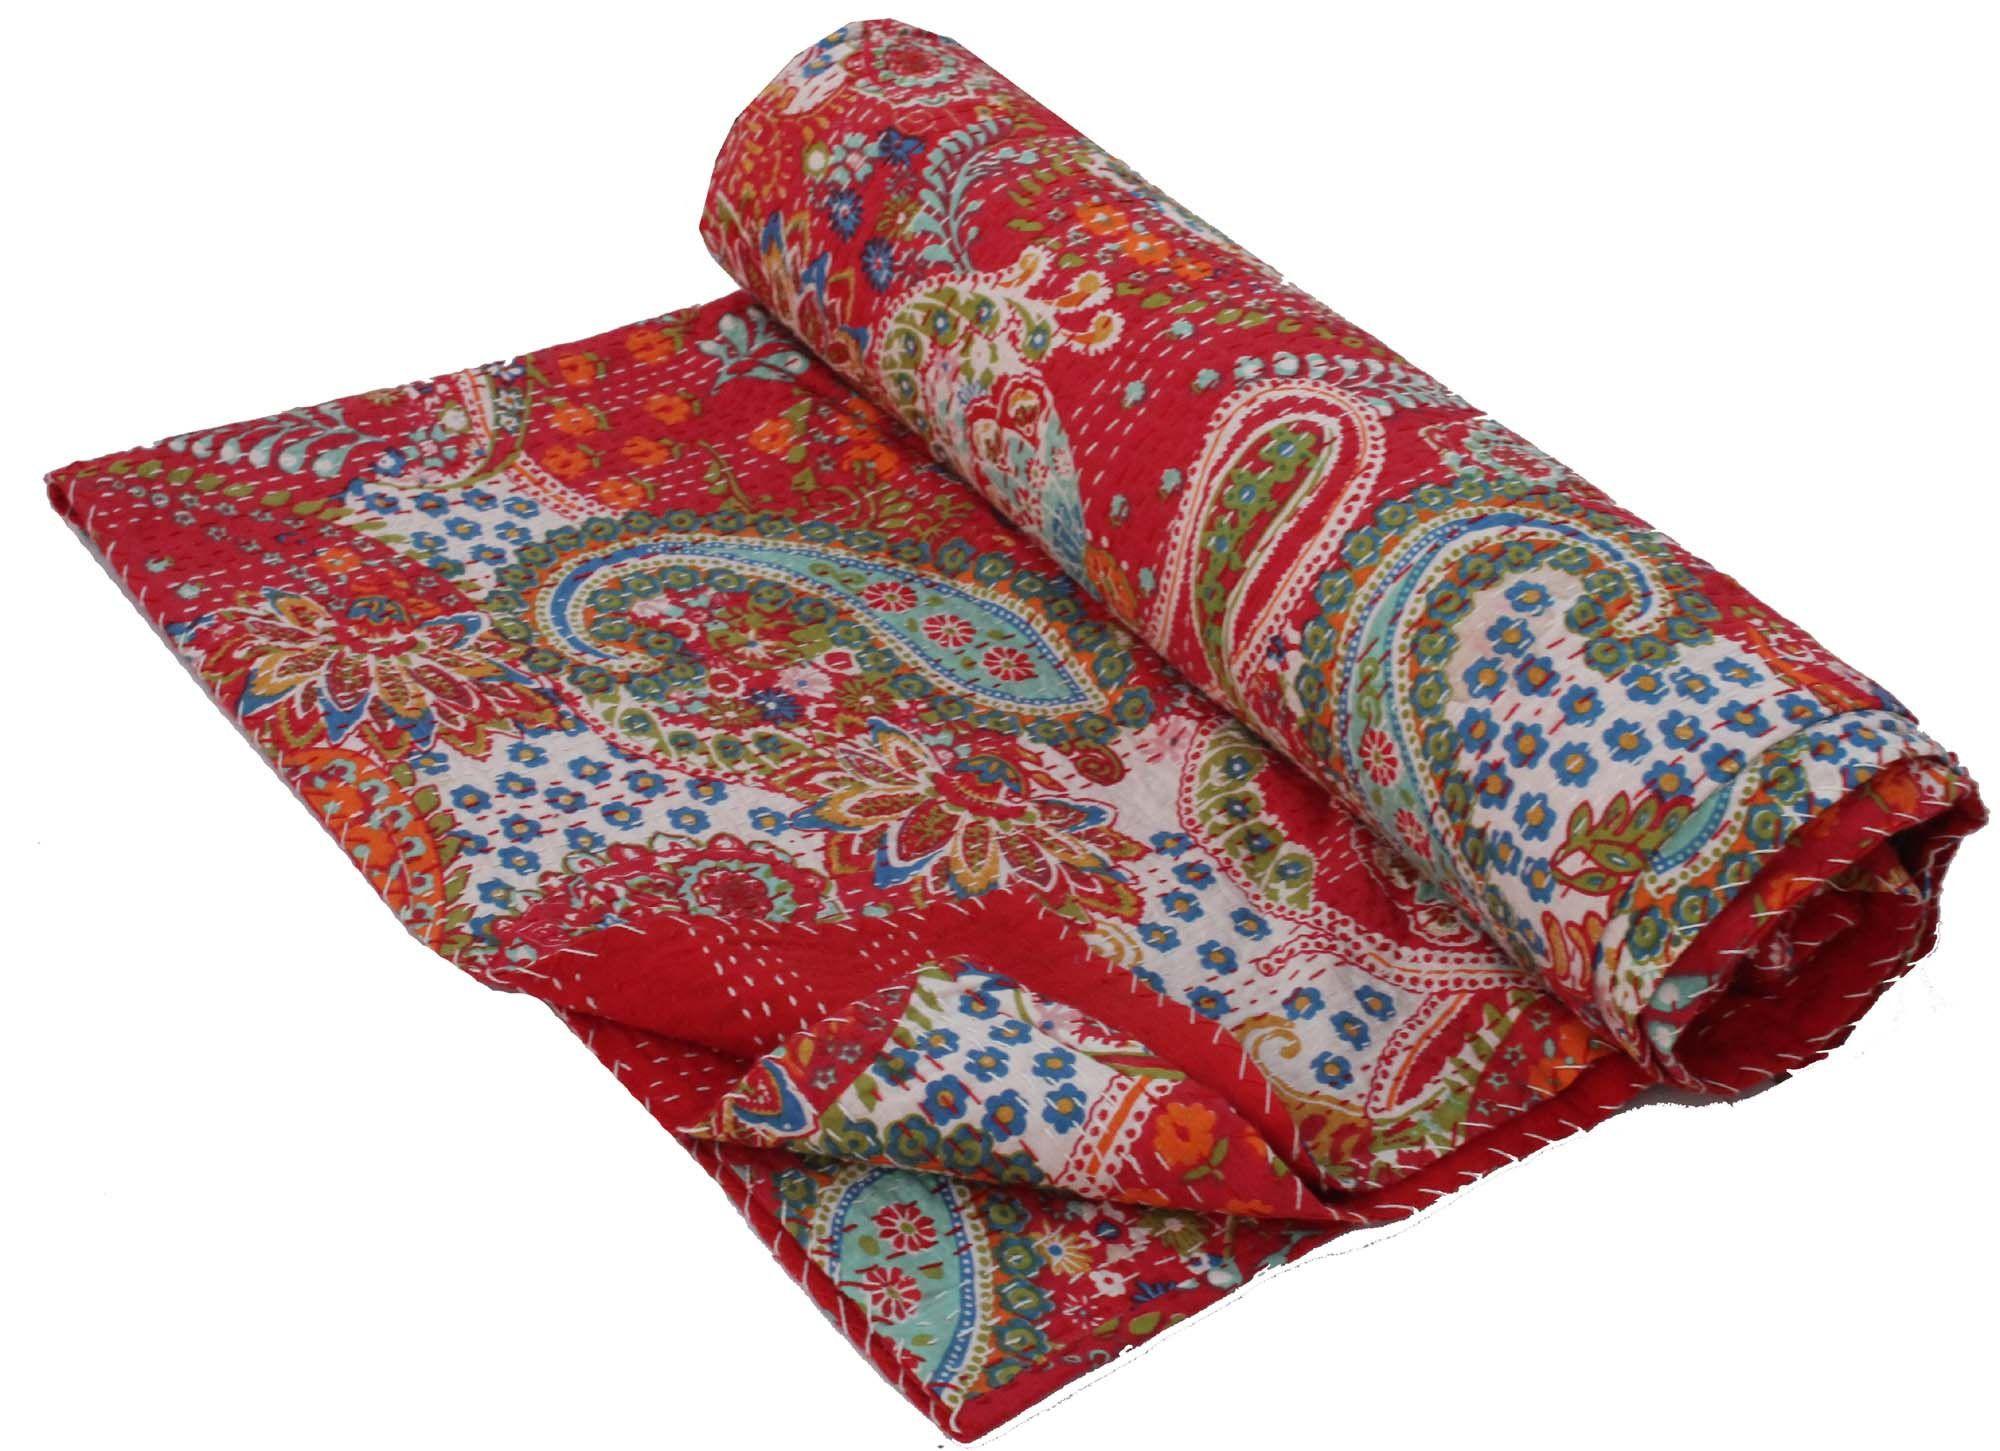 Red Queen Size Kantha Blanket Handmade Kantha Quilt Indian